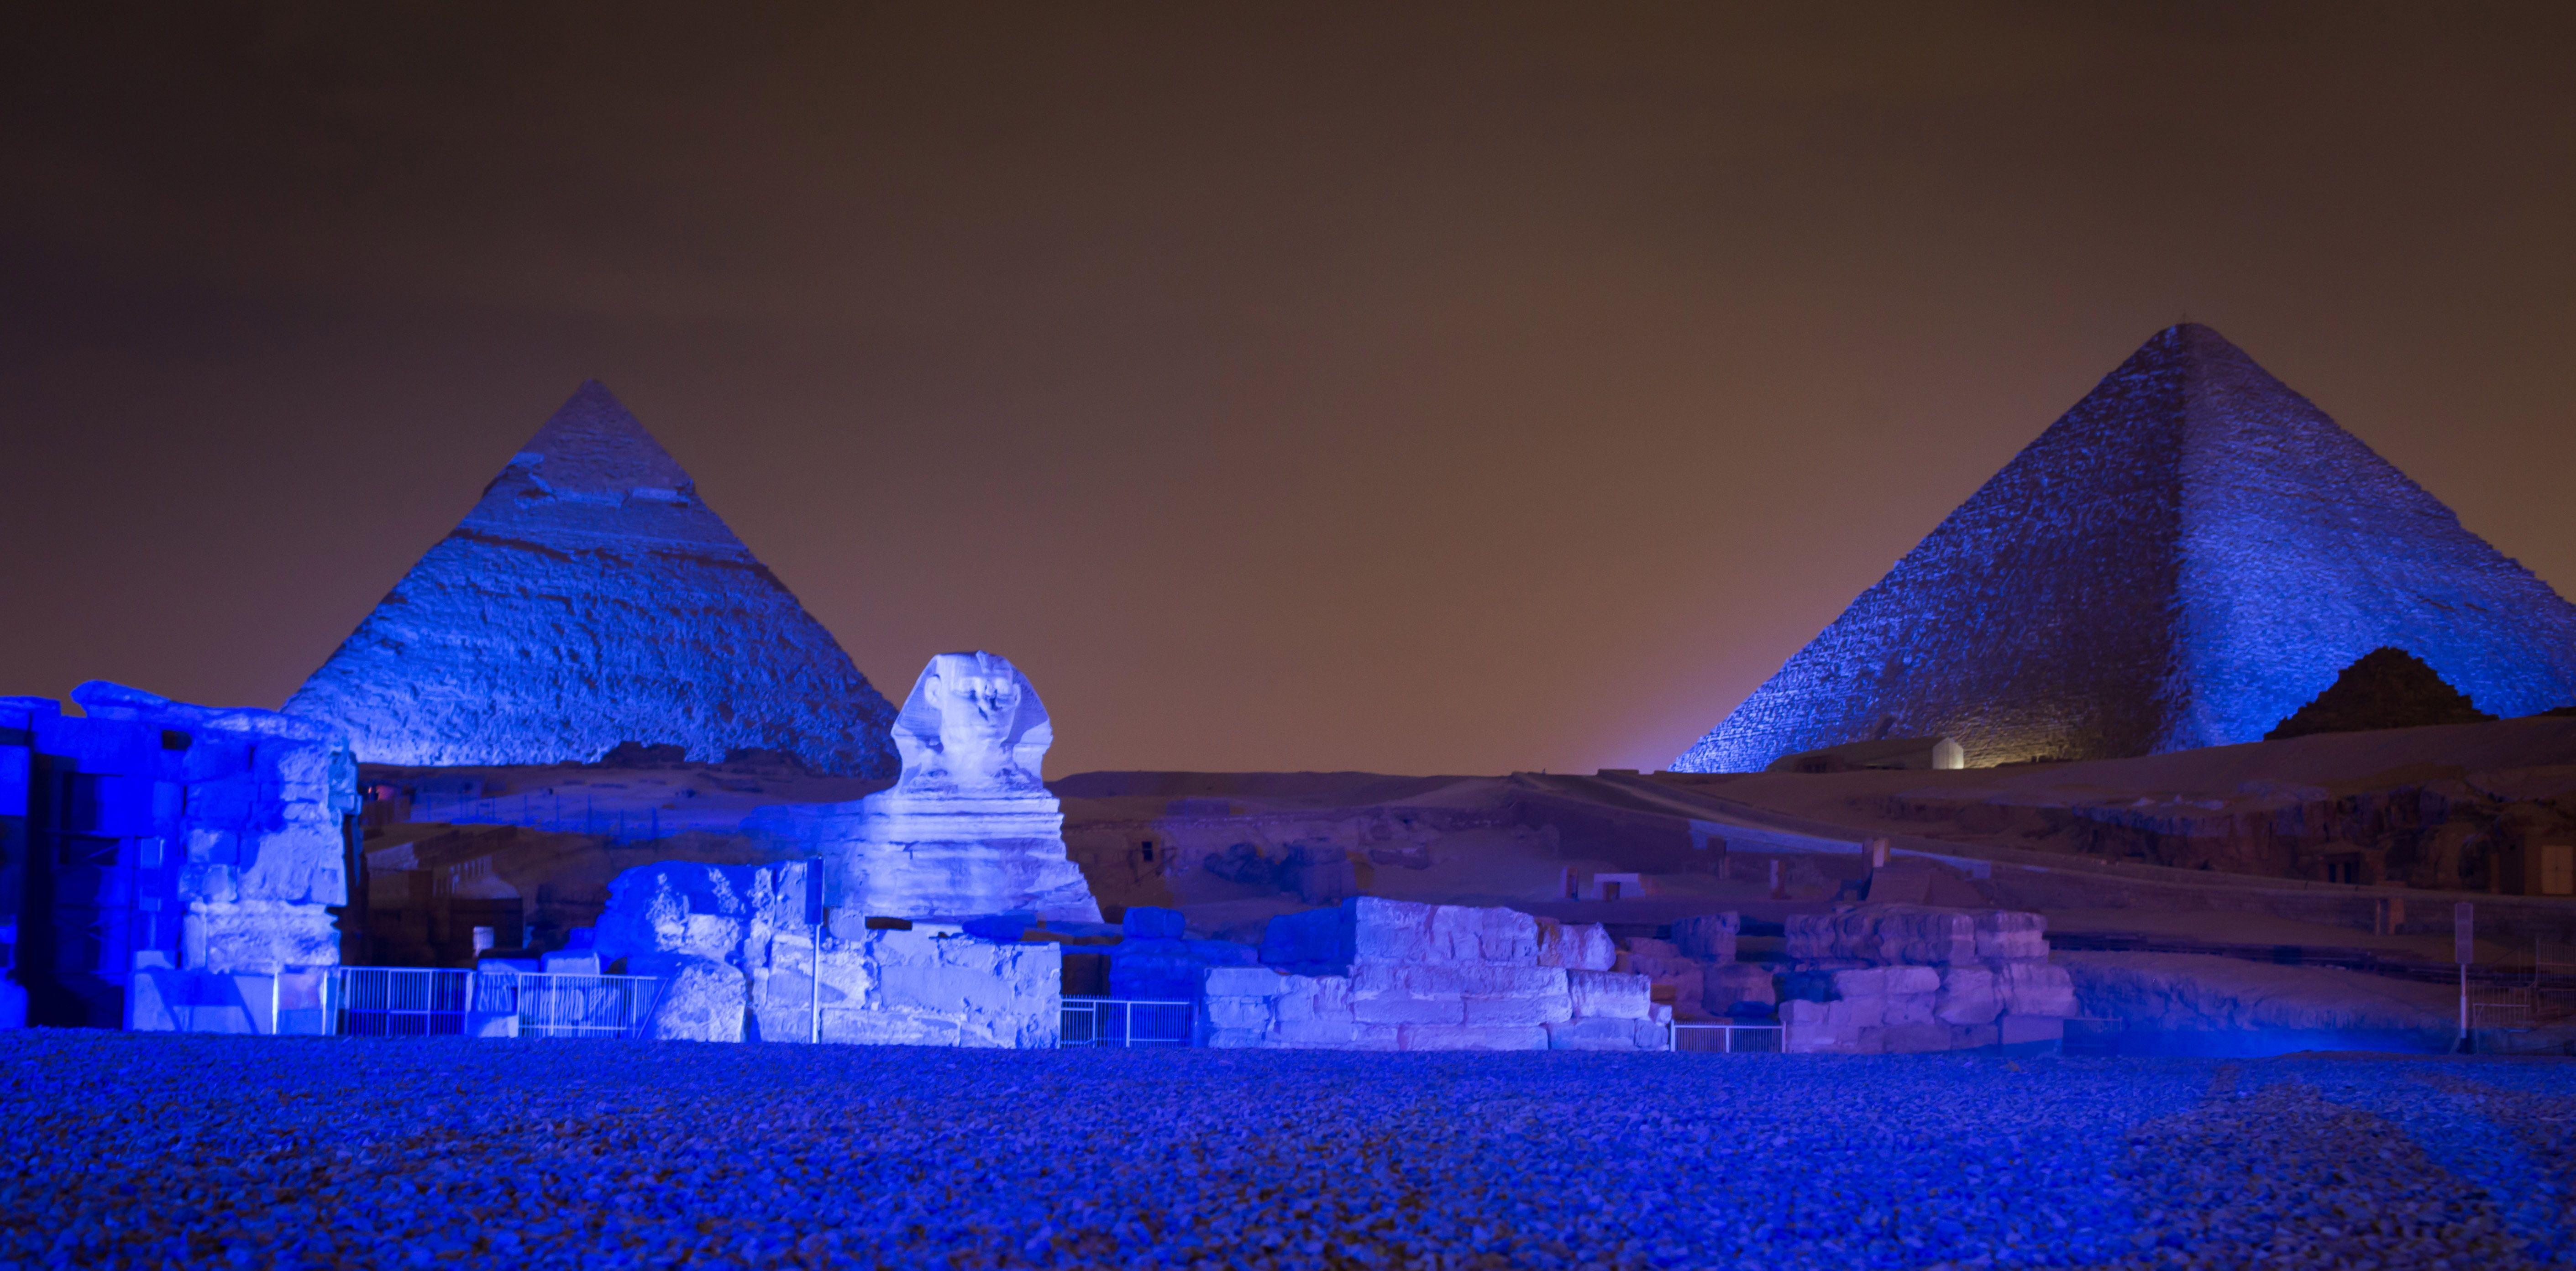 Ben Carson Defends 'Joseph Built Pyramids' Theory – The Forward